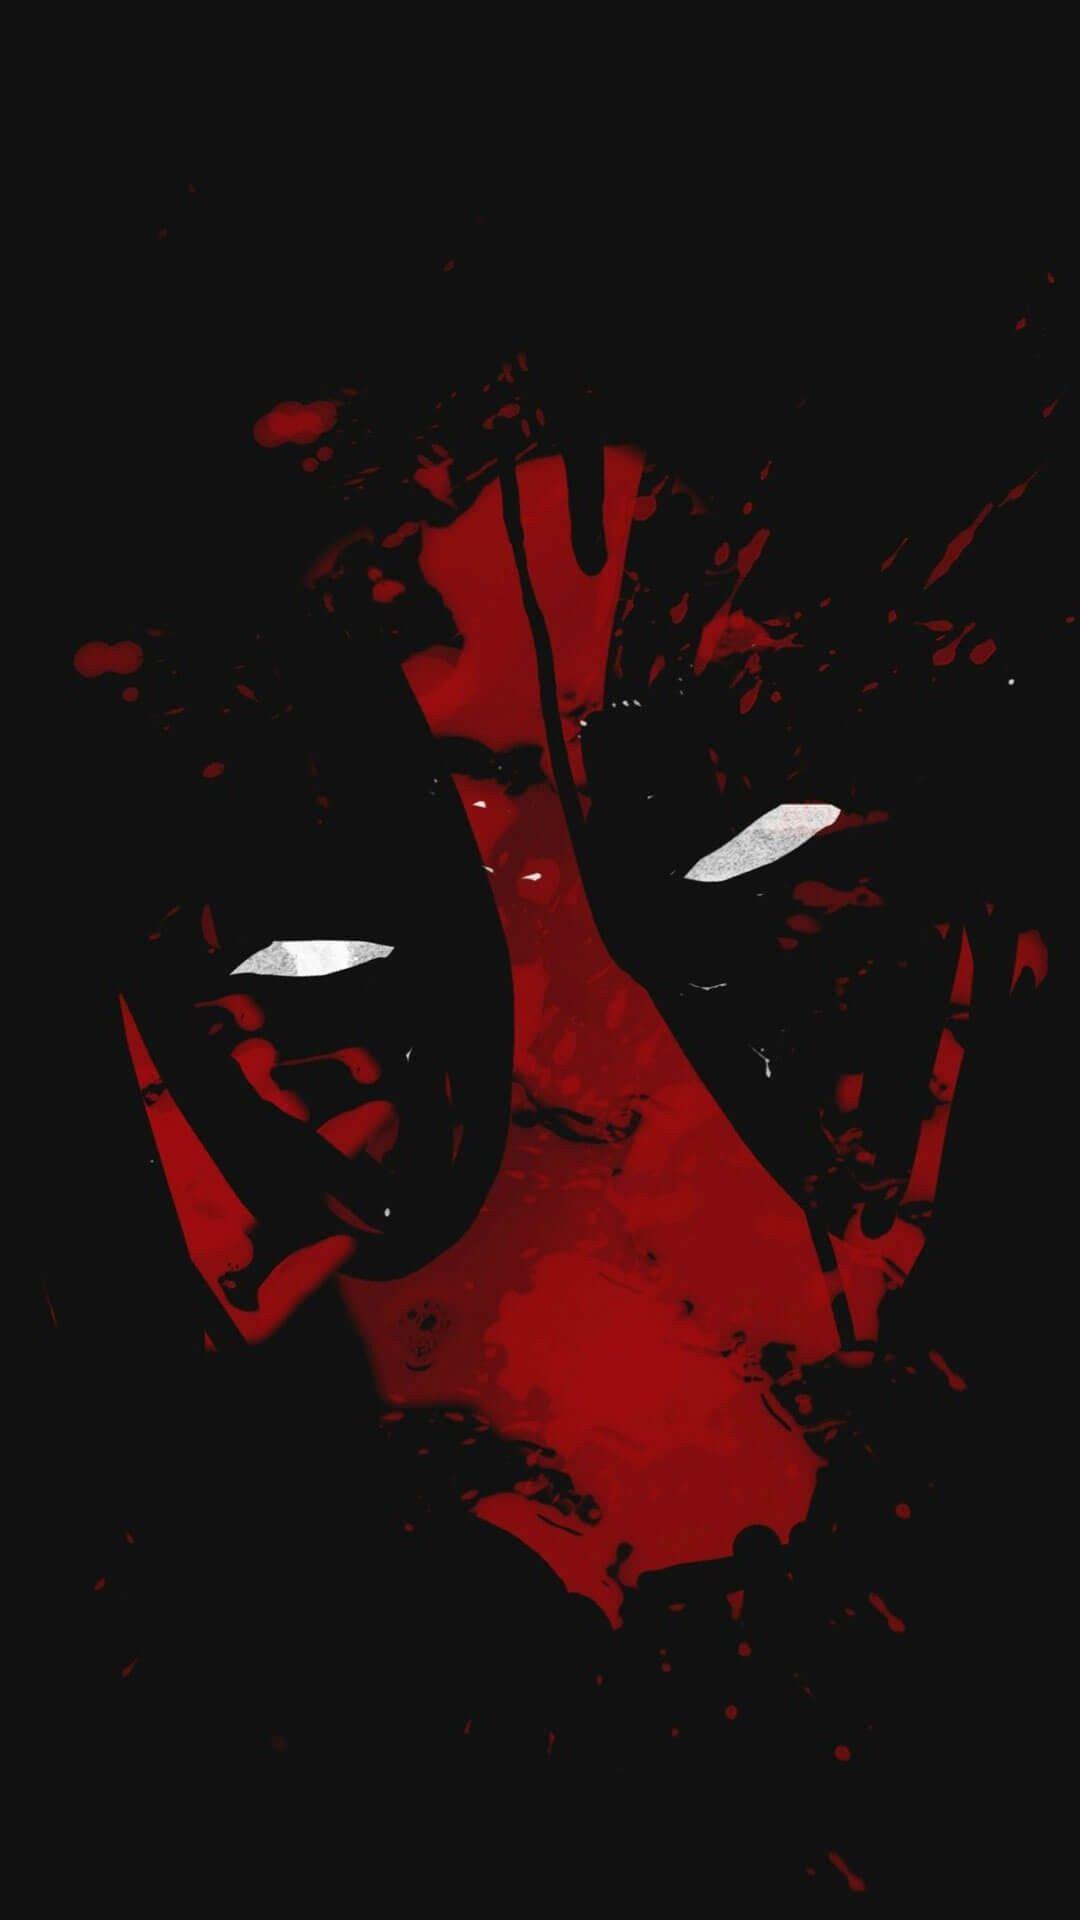 52 Deadpool Iphone 7 Plus Wallpaper On Wallpapersafari